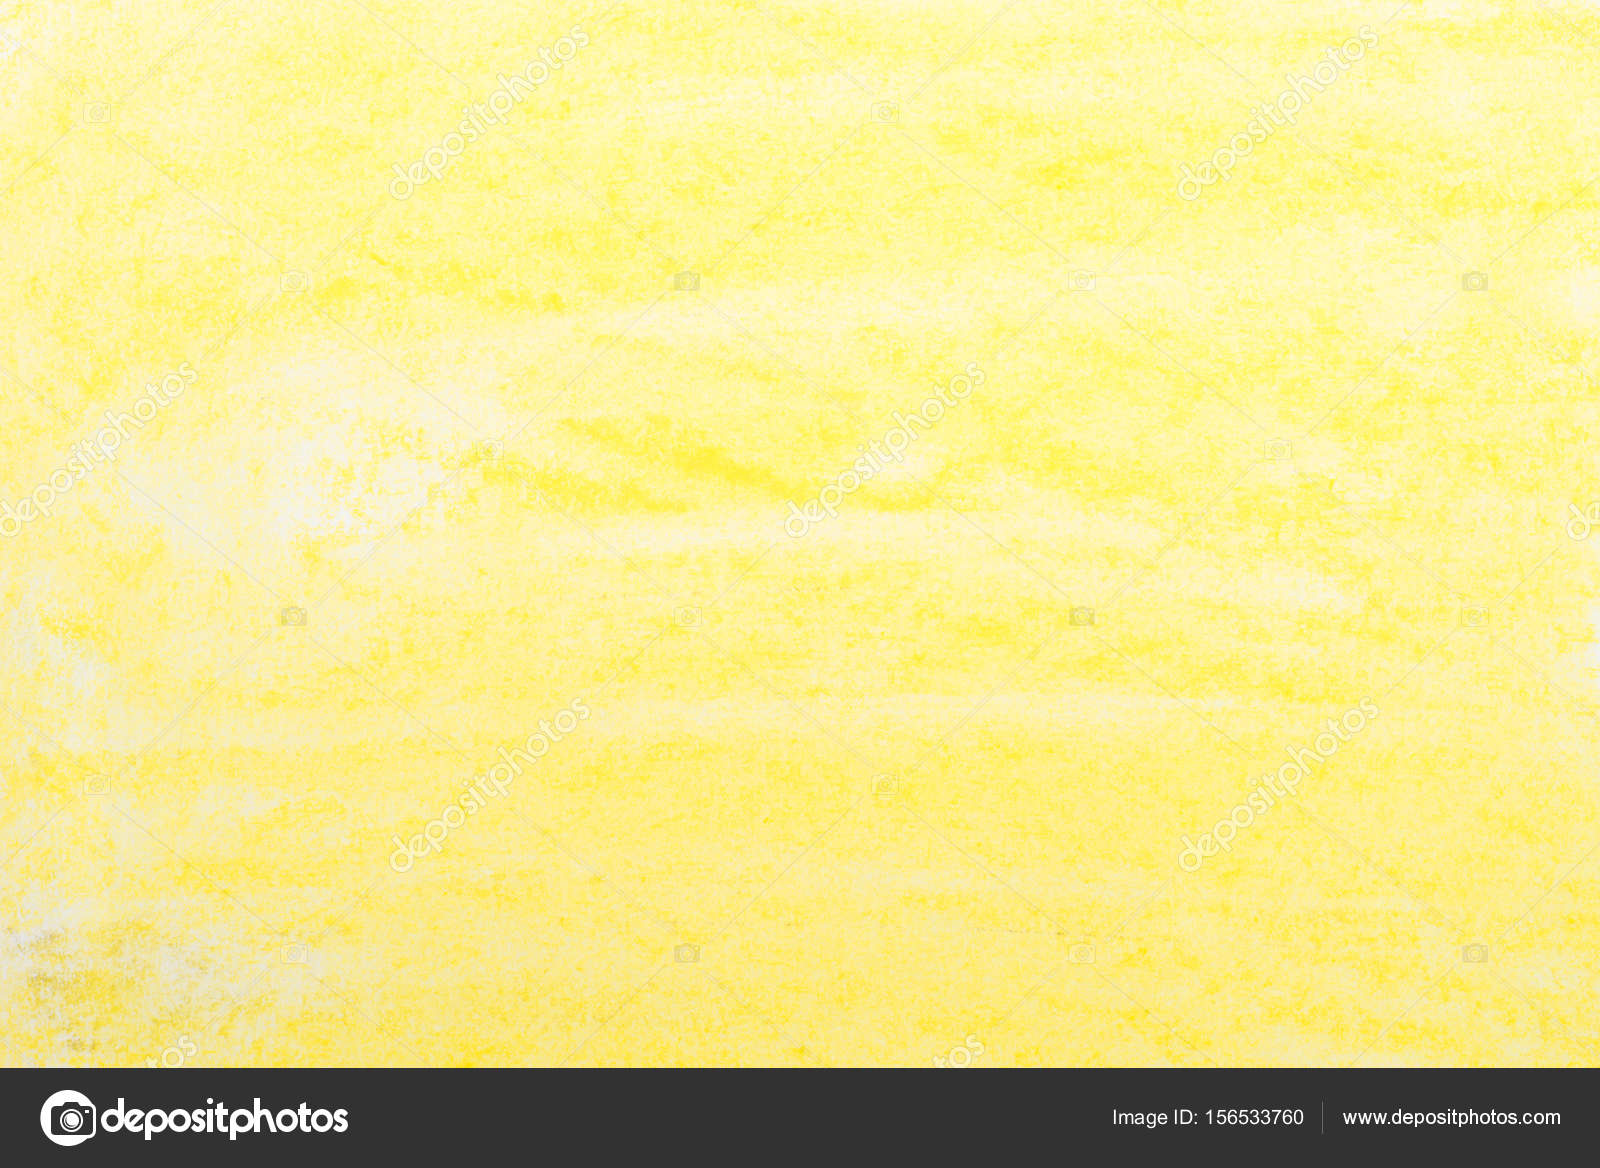 Sfondi in giallo